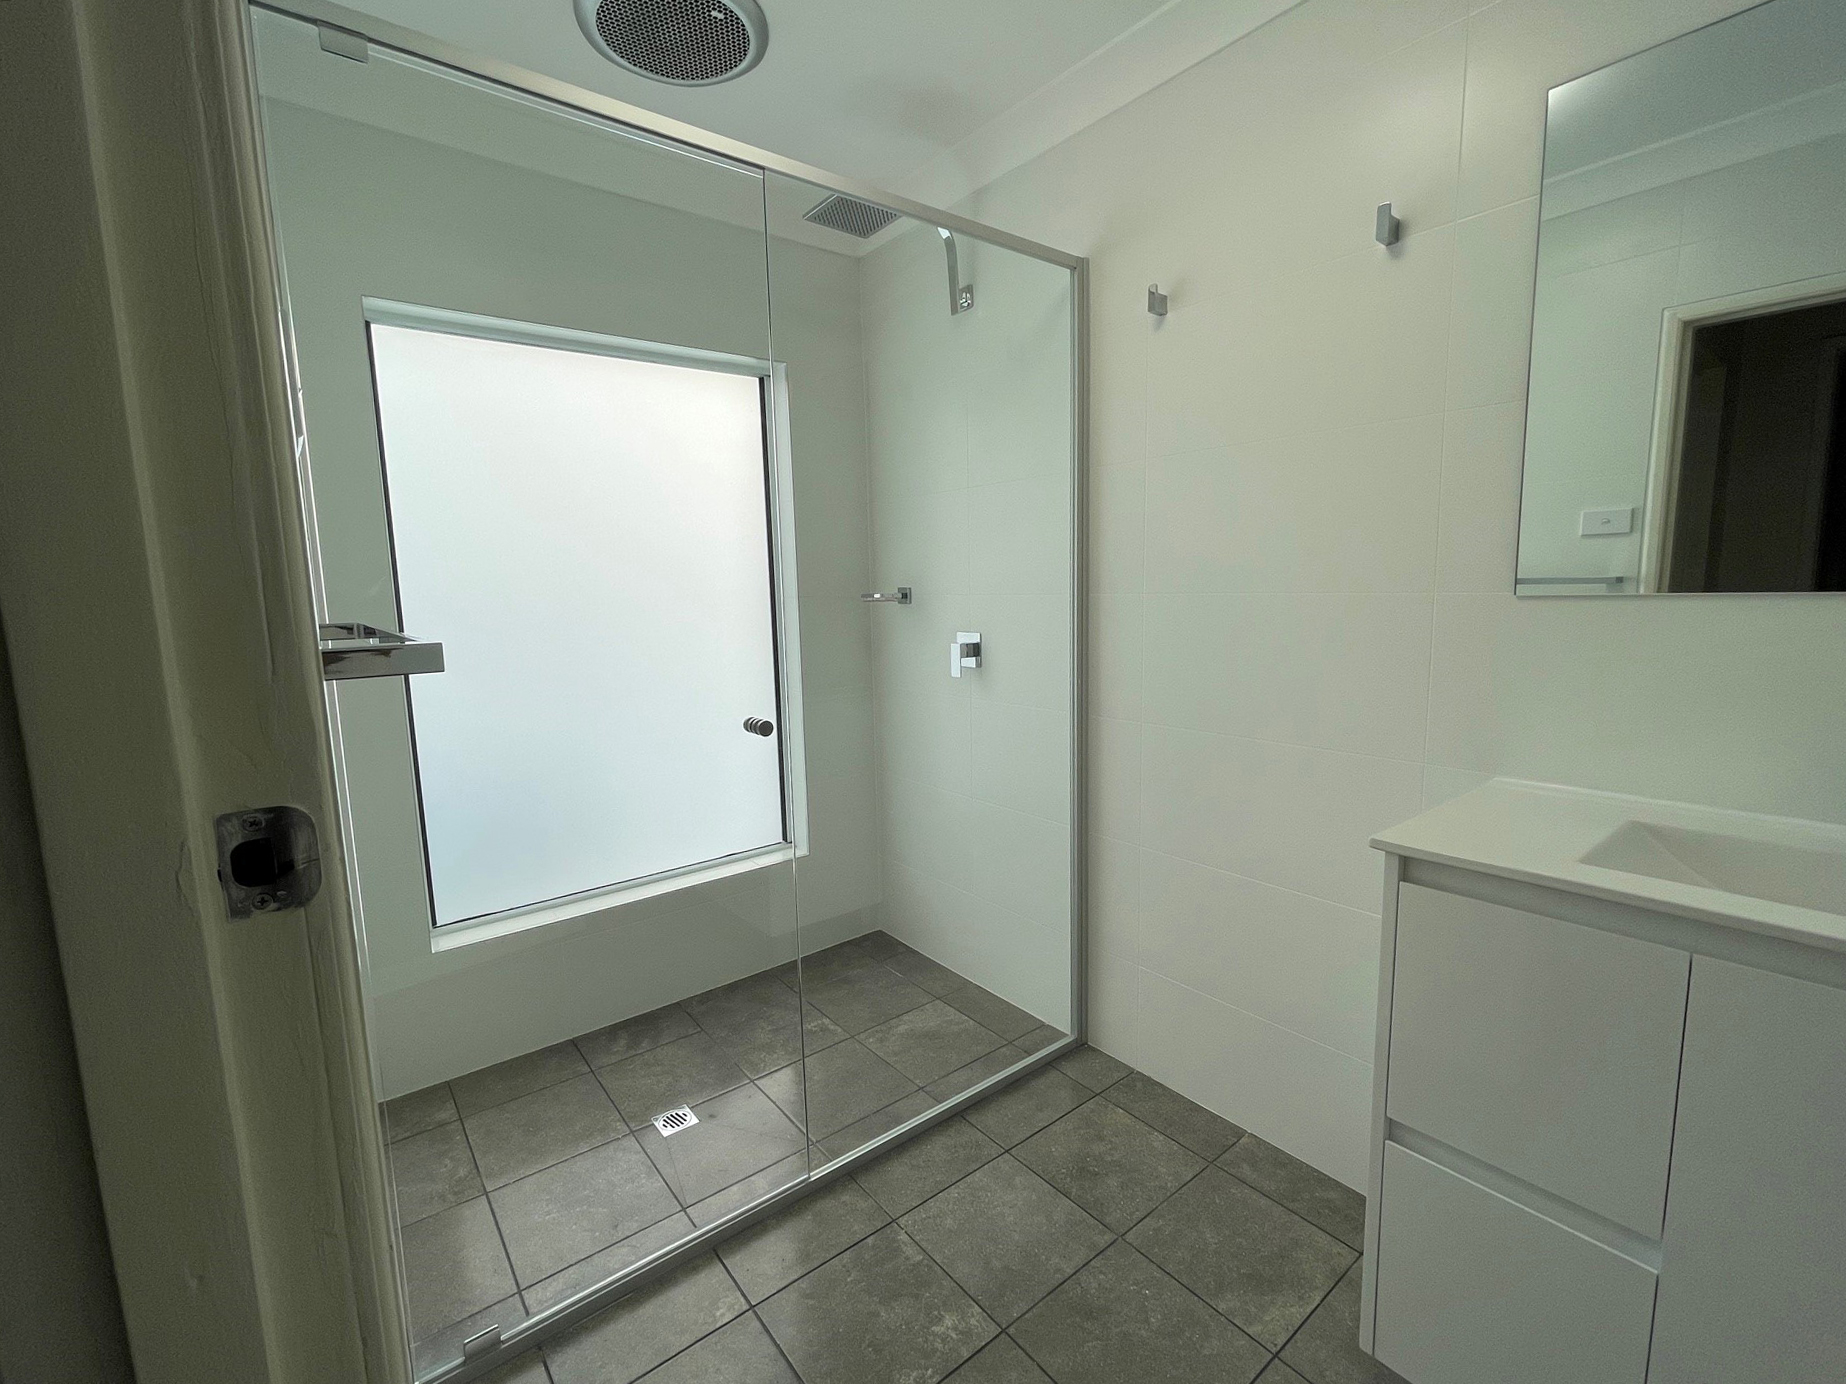 Bathroom Renovations Newcastle | Double Diamond Construction